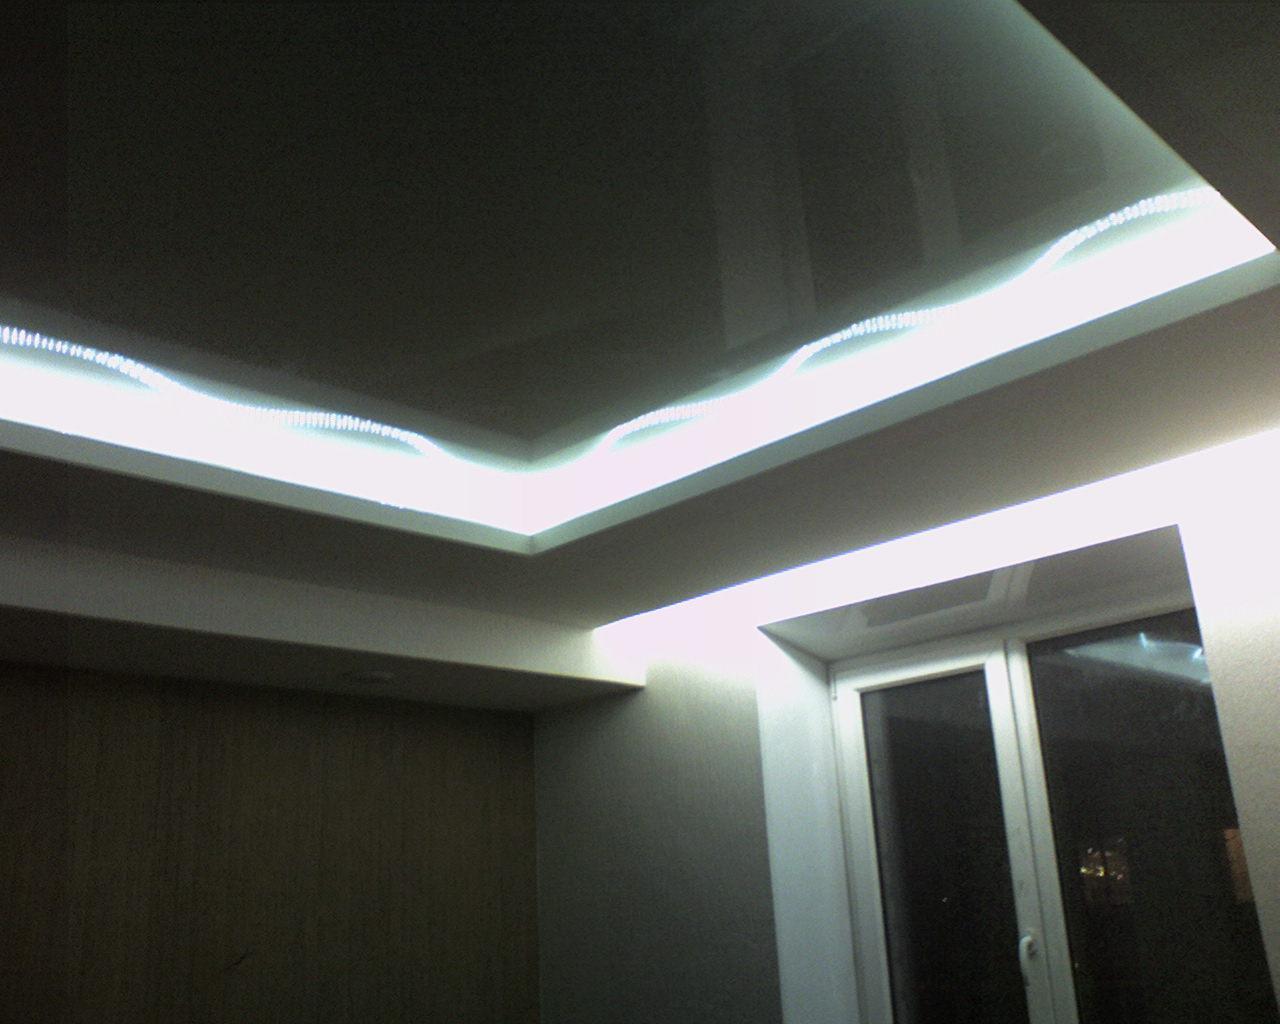 Pose lambris plafond platre nice prix maison de 100m2 soci t ajnnp - Chauffage radiant plafond ...